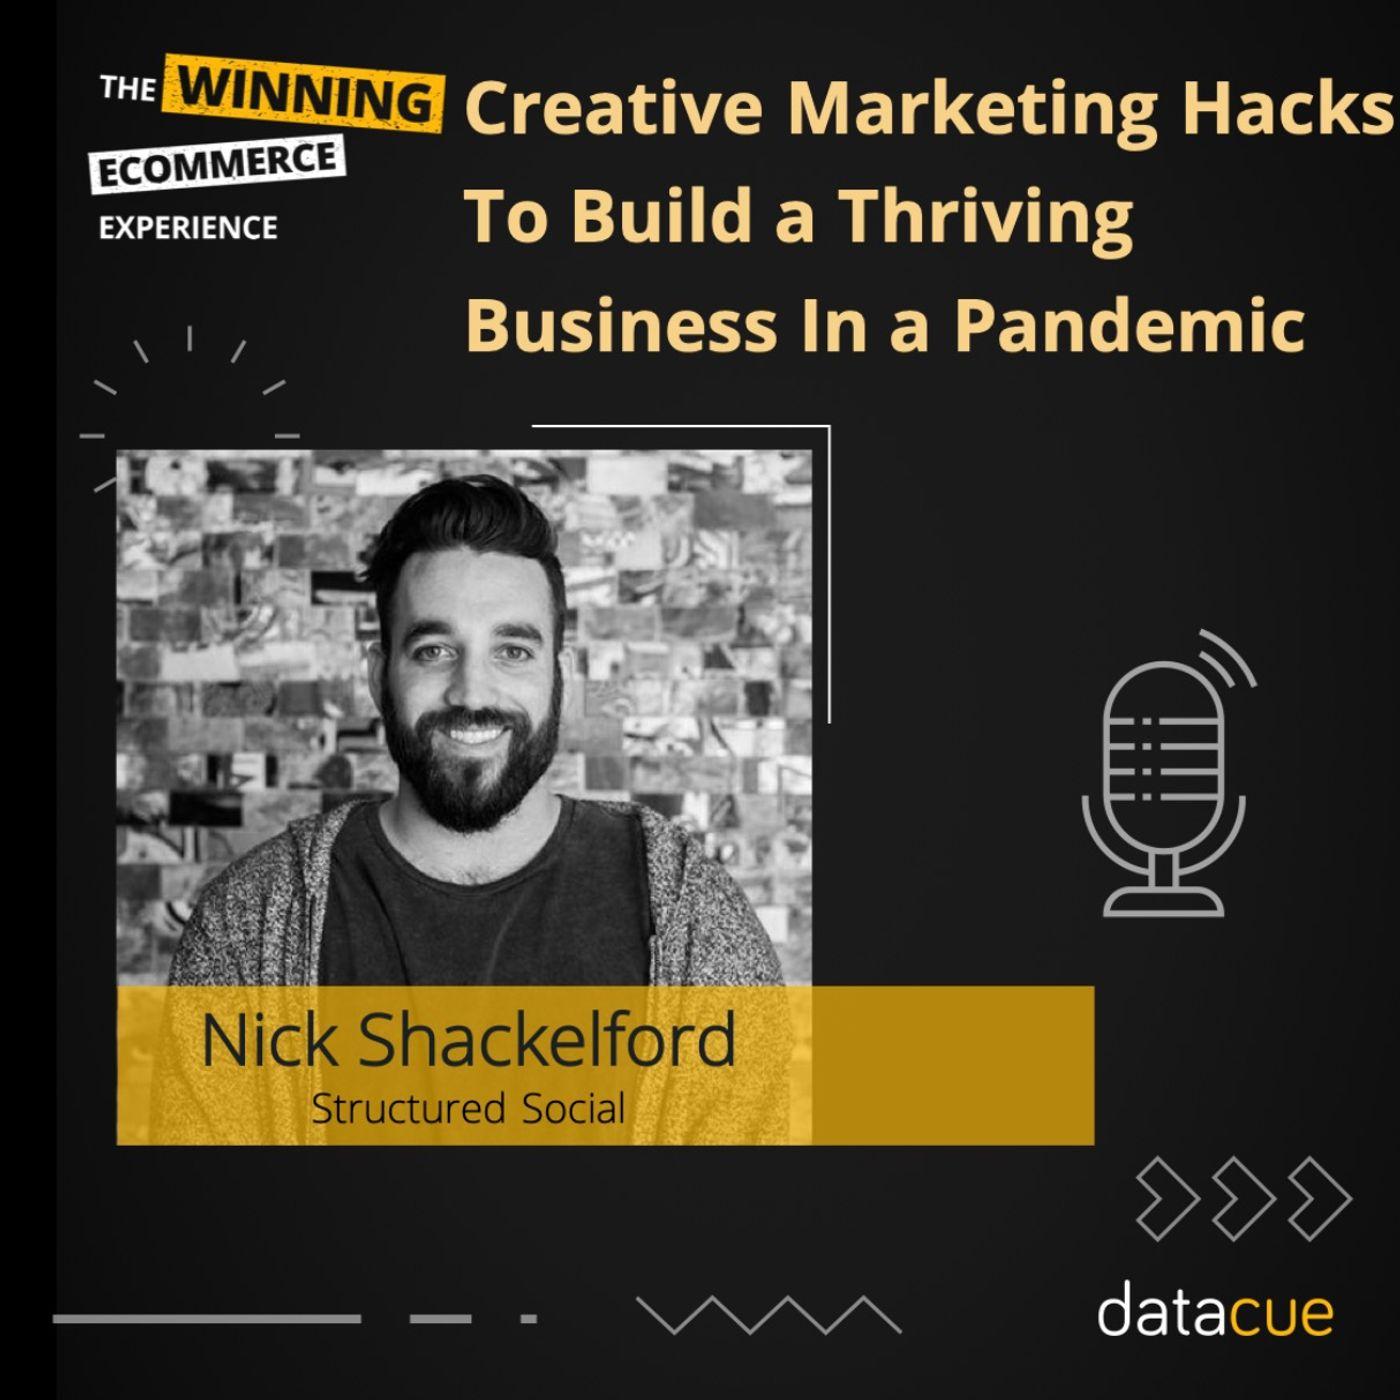 Nick Shackelford